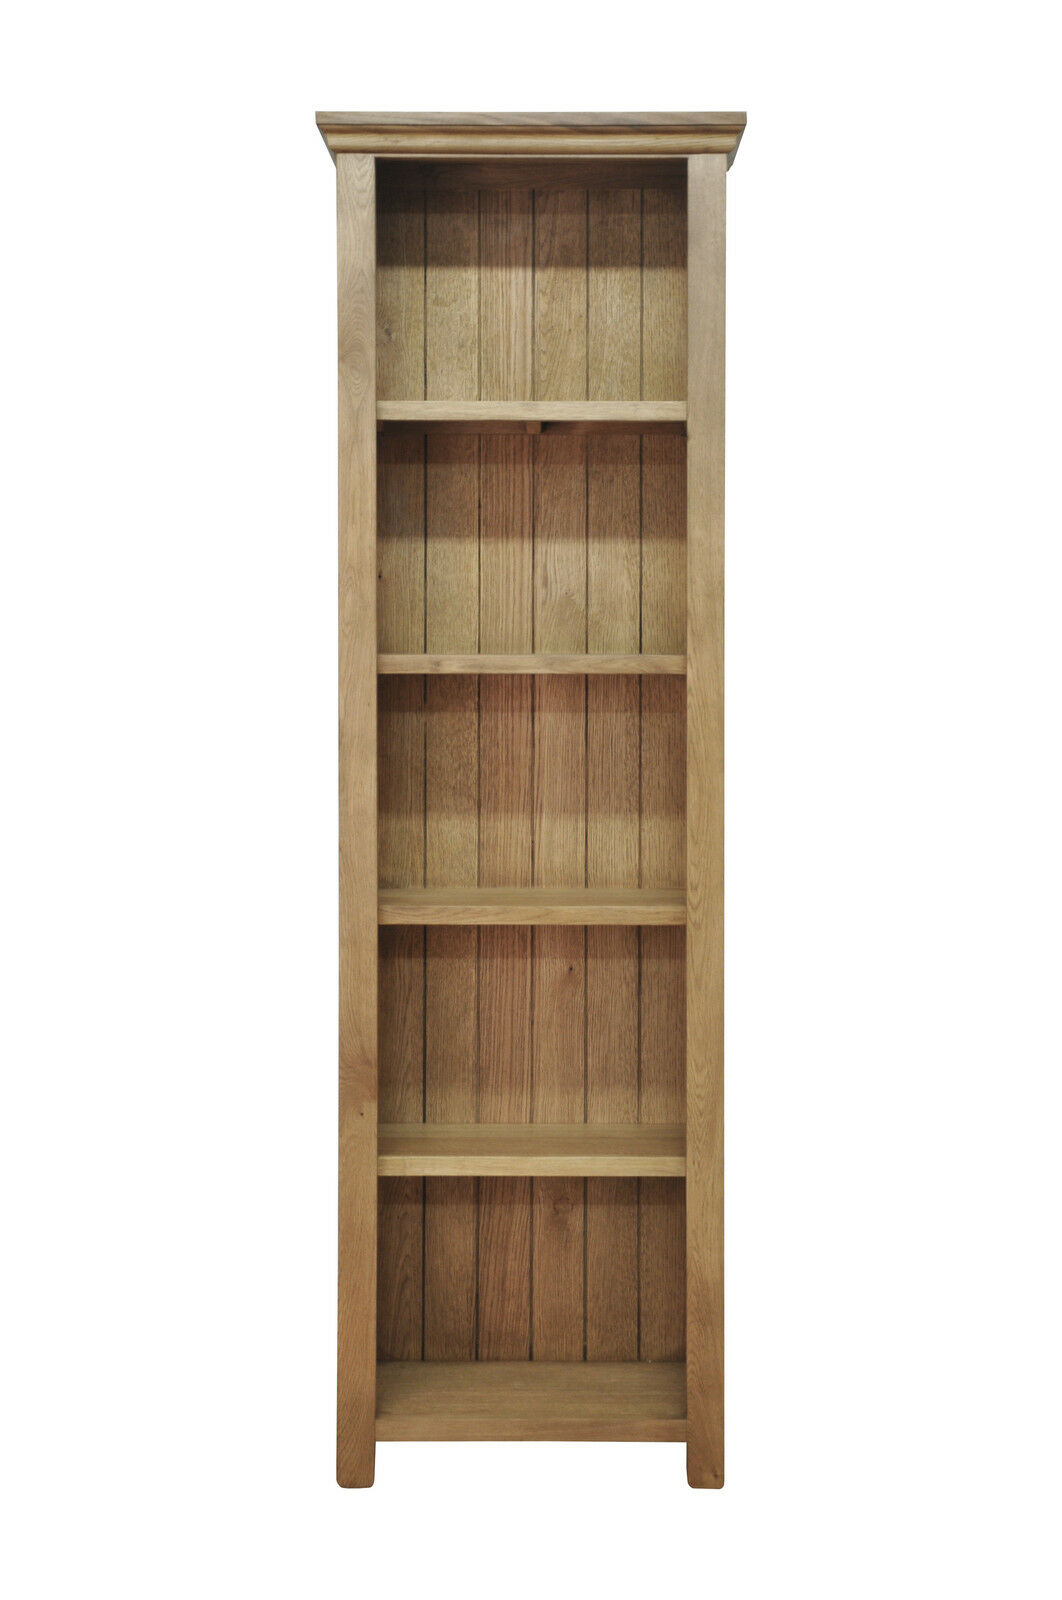 New Bookcase Toy Box White Finish Bedroom Playroom Child: Toronto Solid Oak Large Narrow Bookcase / Bookshelf